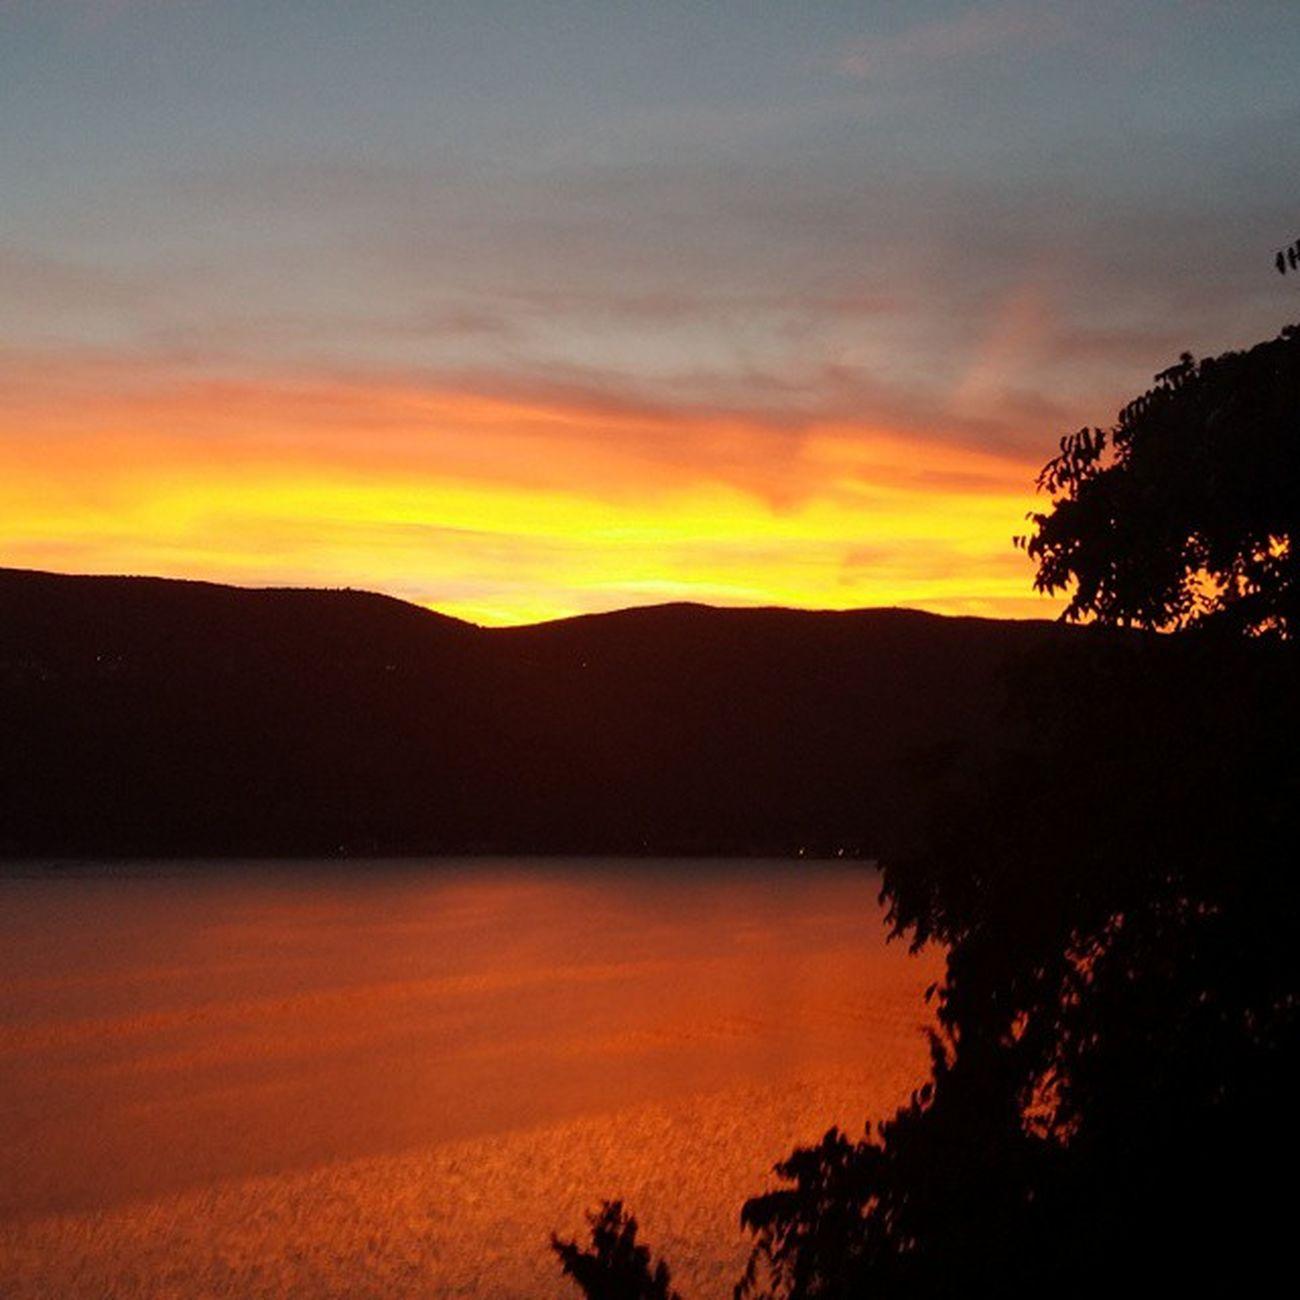 Weather transgression Hercegnovi Bayofkotor Bokakotorska Baylife Sunset Orange Sea Sky